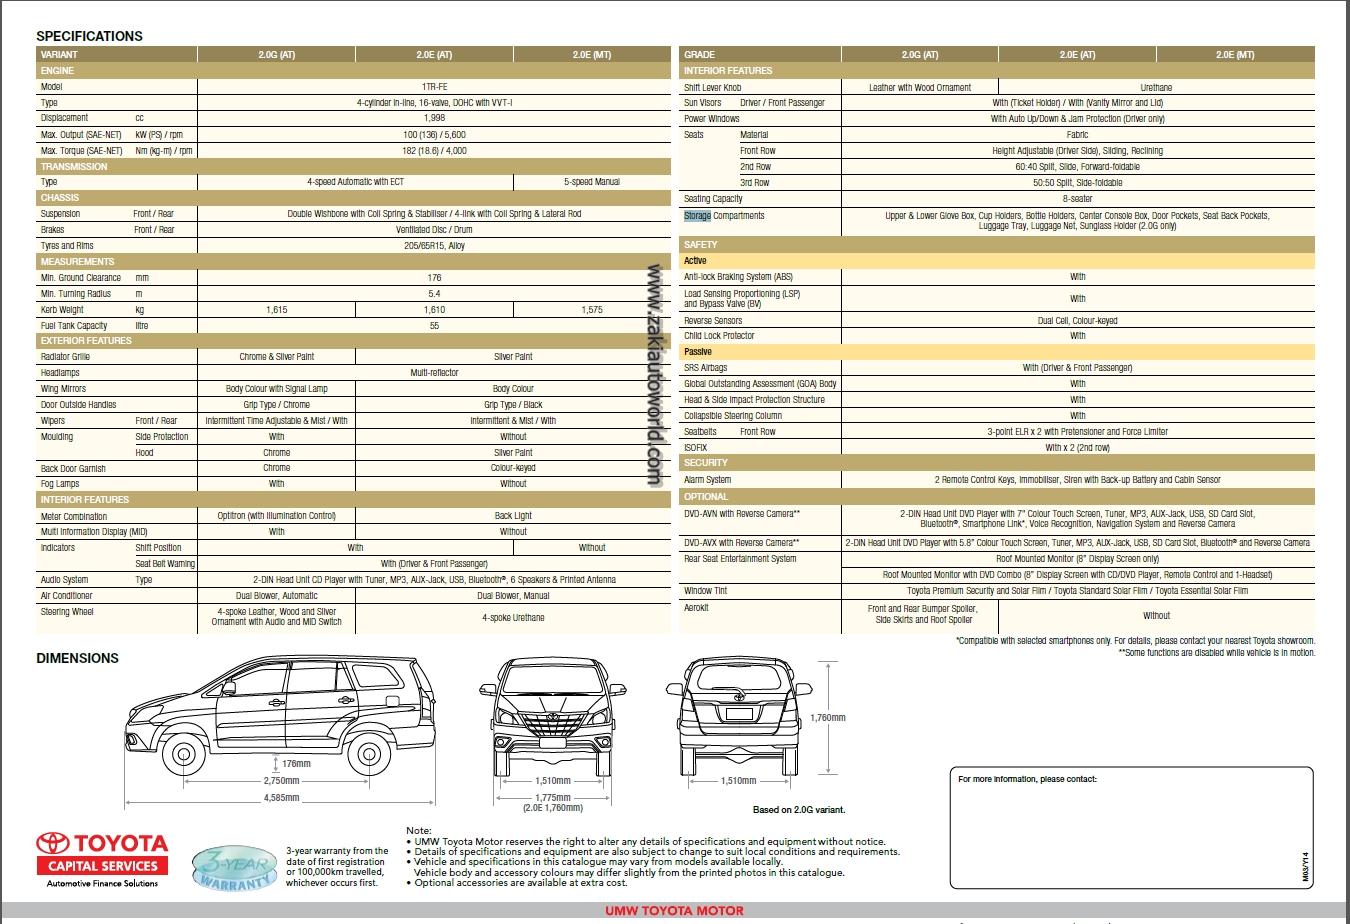 harga all new kijang innova 2016 type g toyota camry 2012 diskaunrebate promosi proton  perodua honda